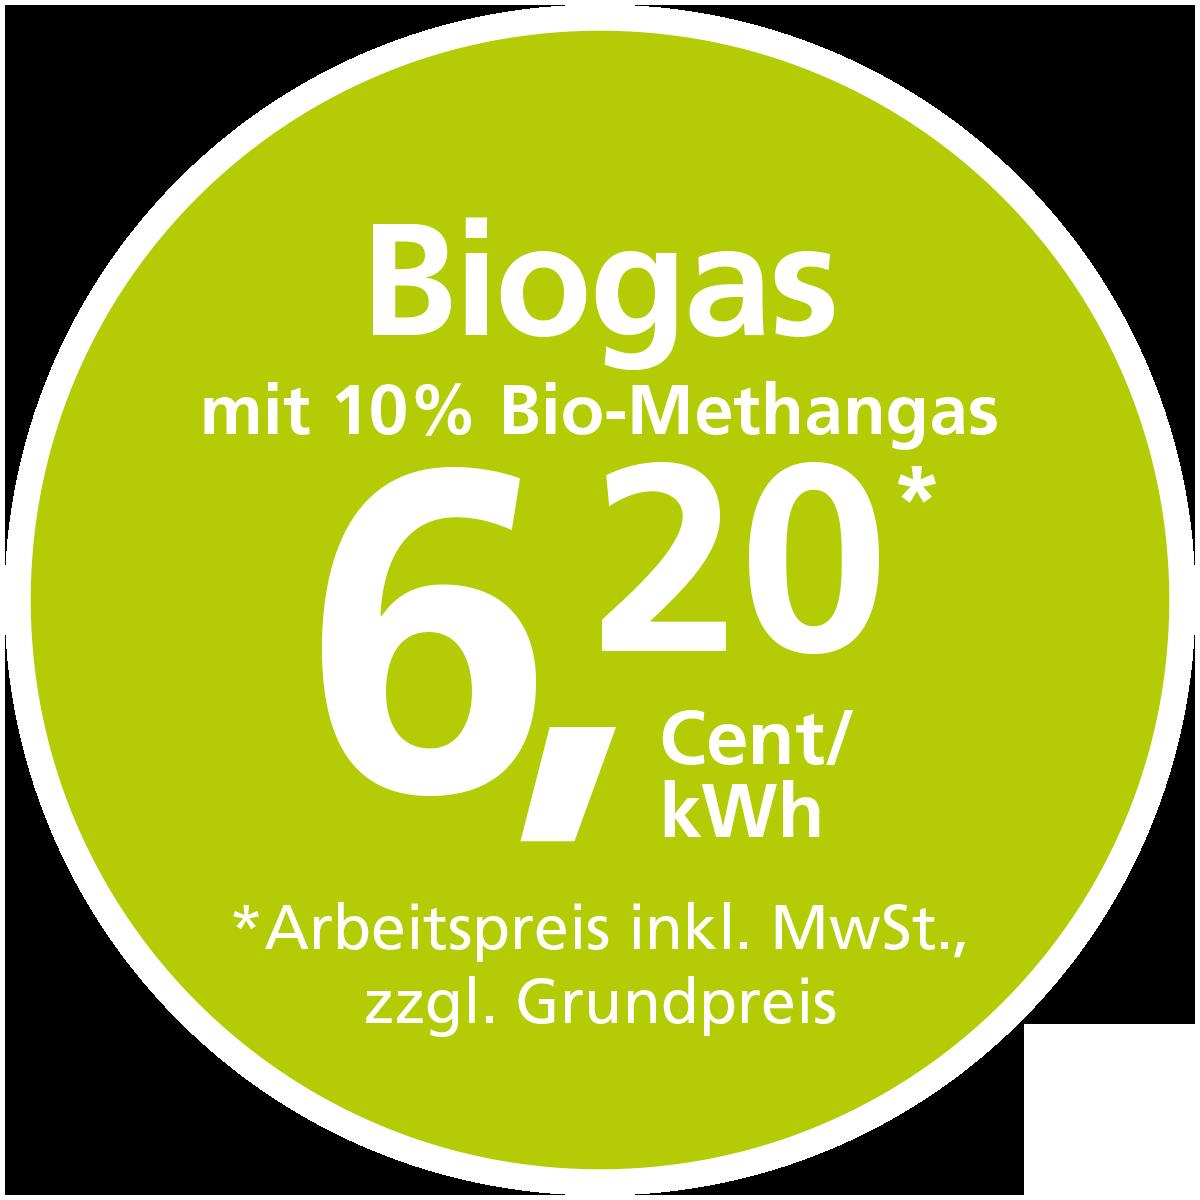 Stadtwerke Winnenden: Gas Biogas